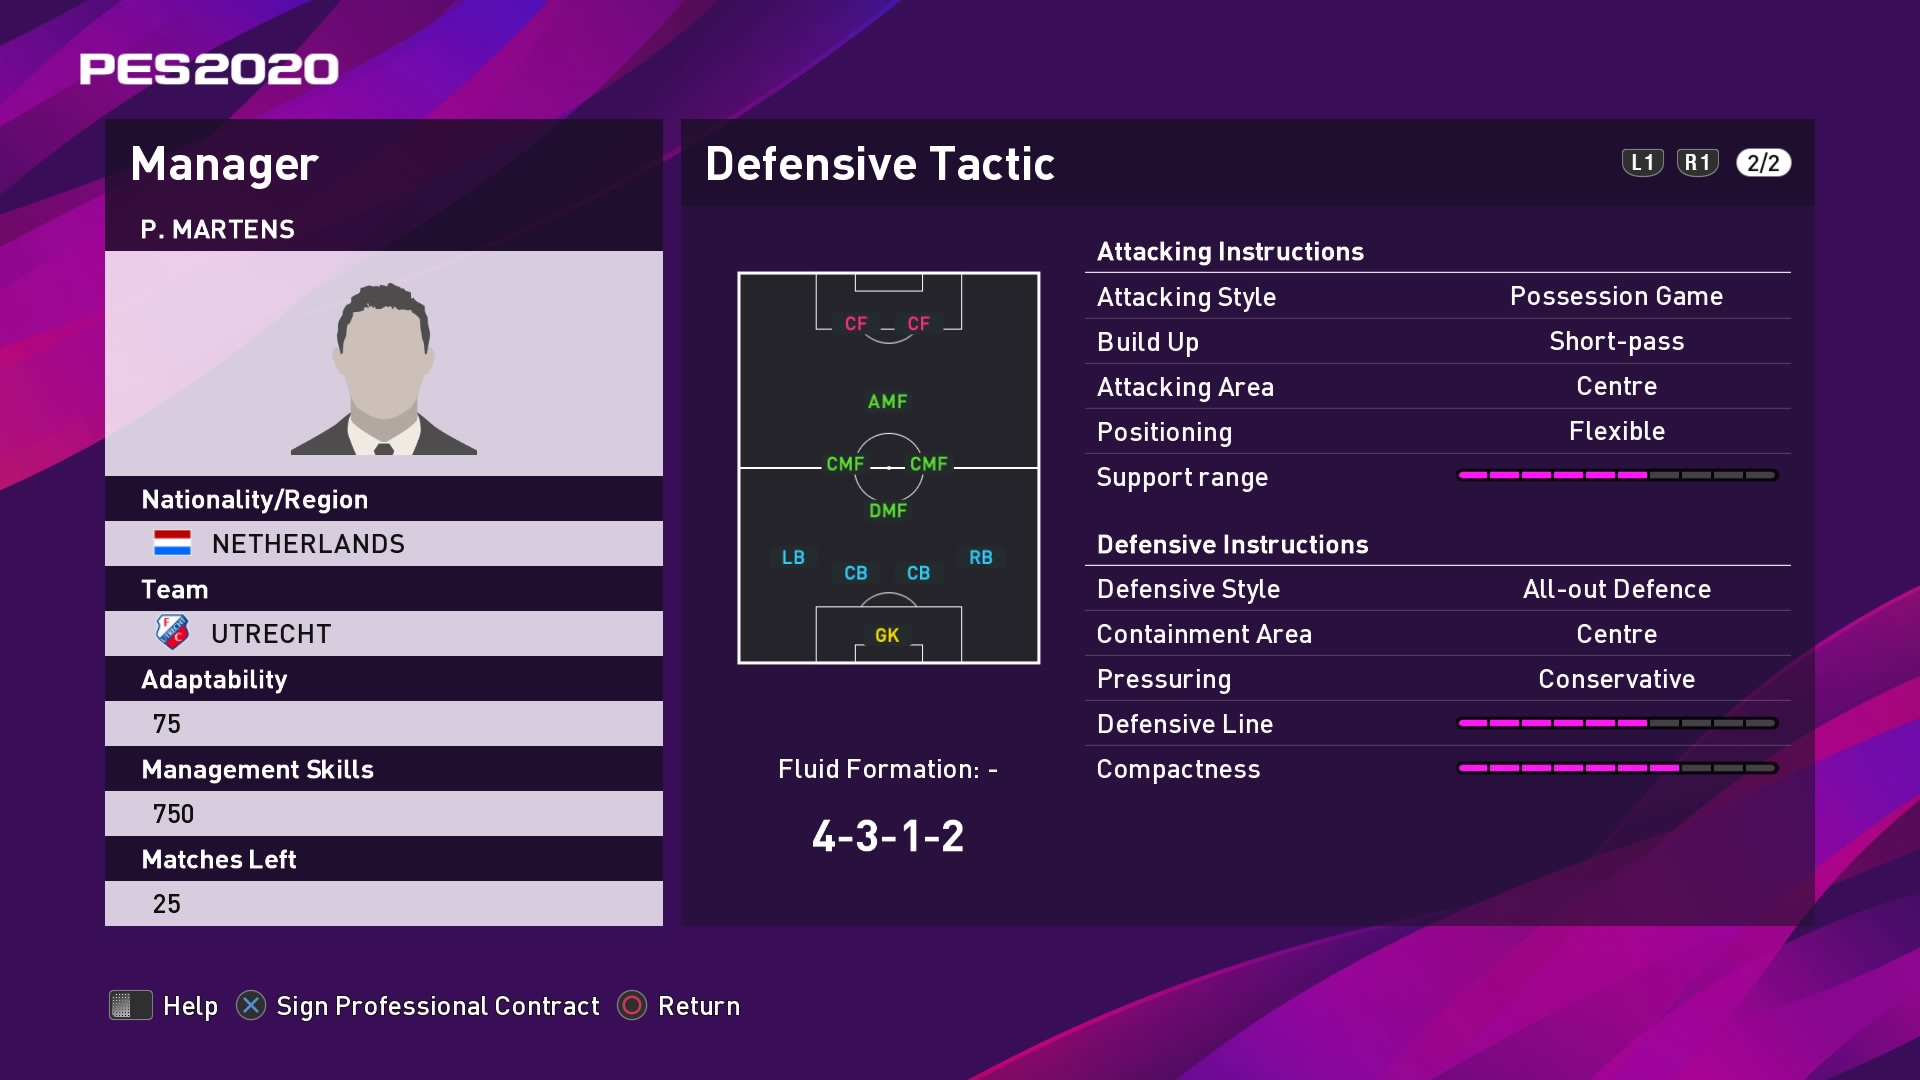 P. Martens (2) (John van den Brom) Defensive Tactic in PES 2020 myClub